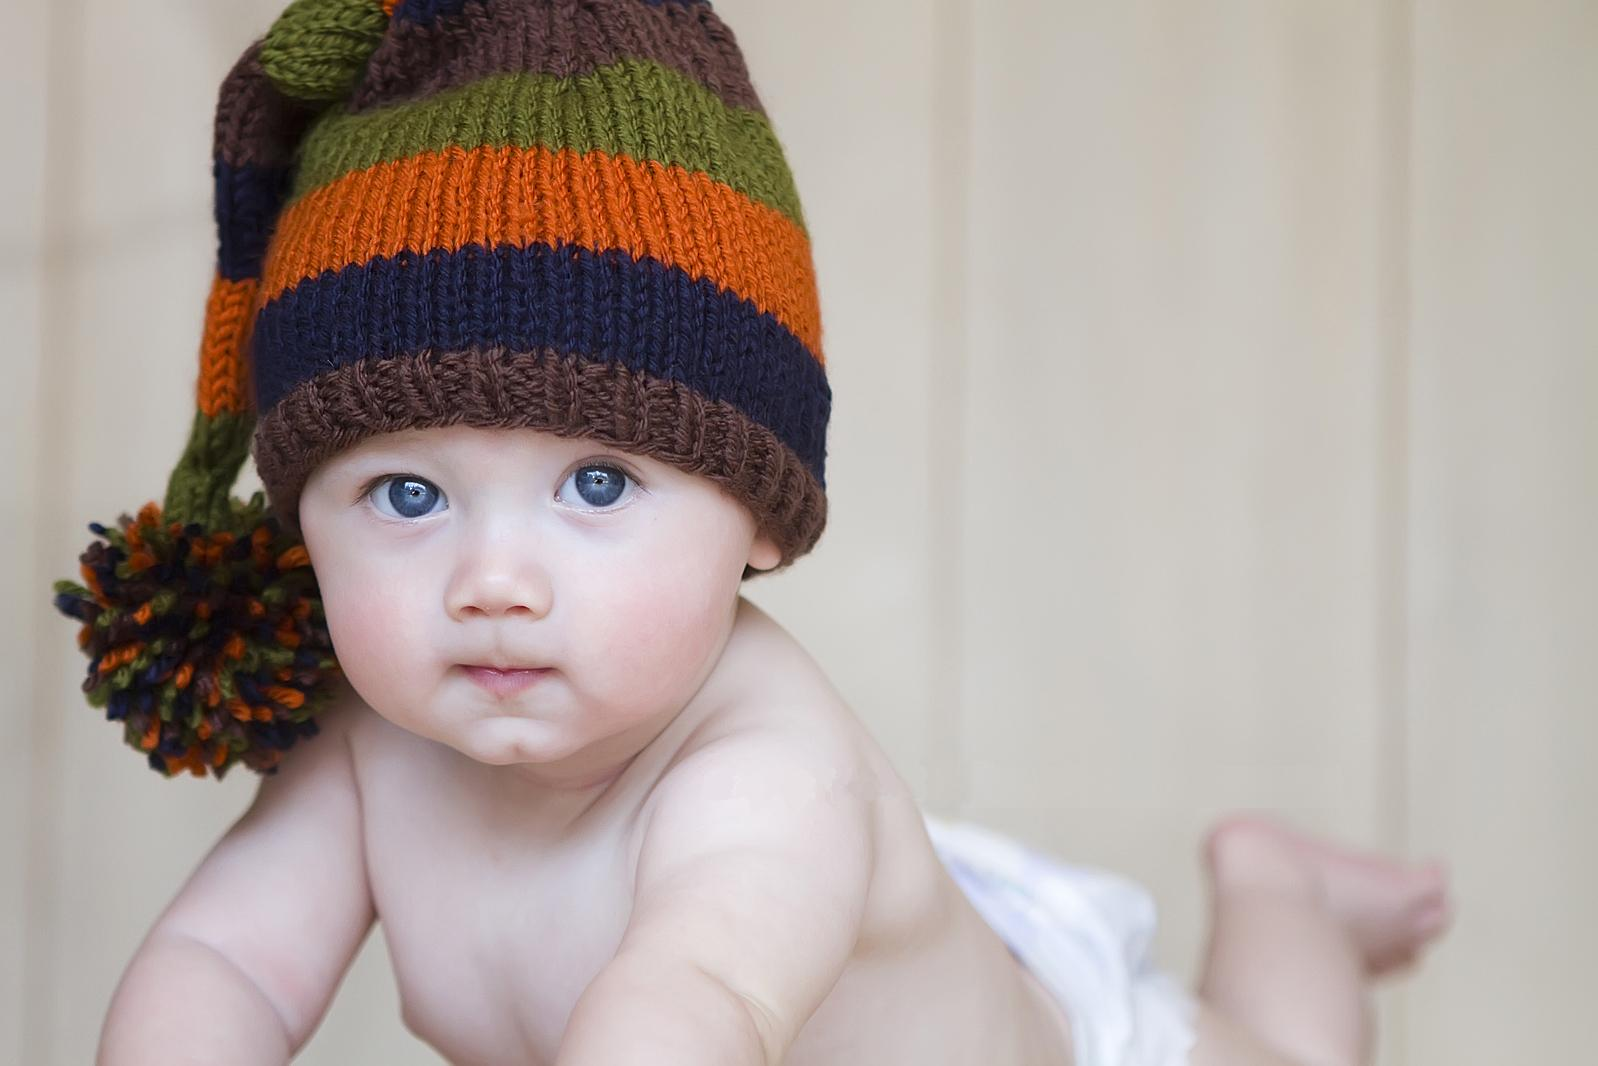 Cute Baby Crochet Hat Wallpapers 1598x1066 118873